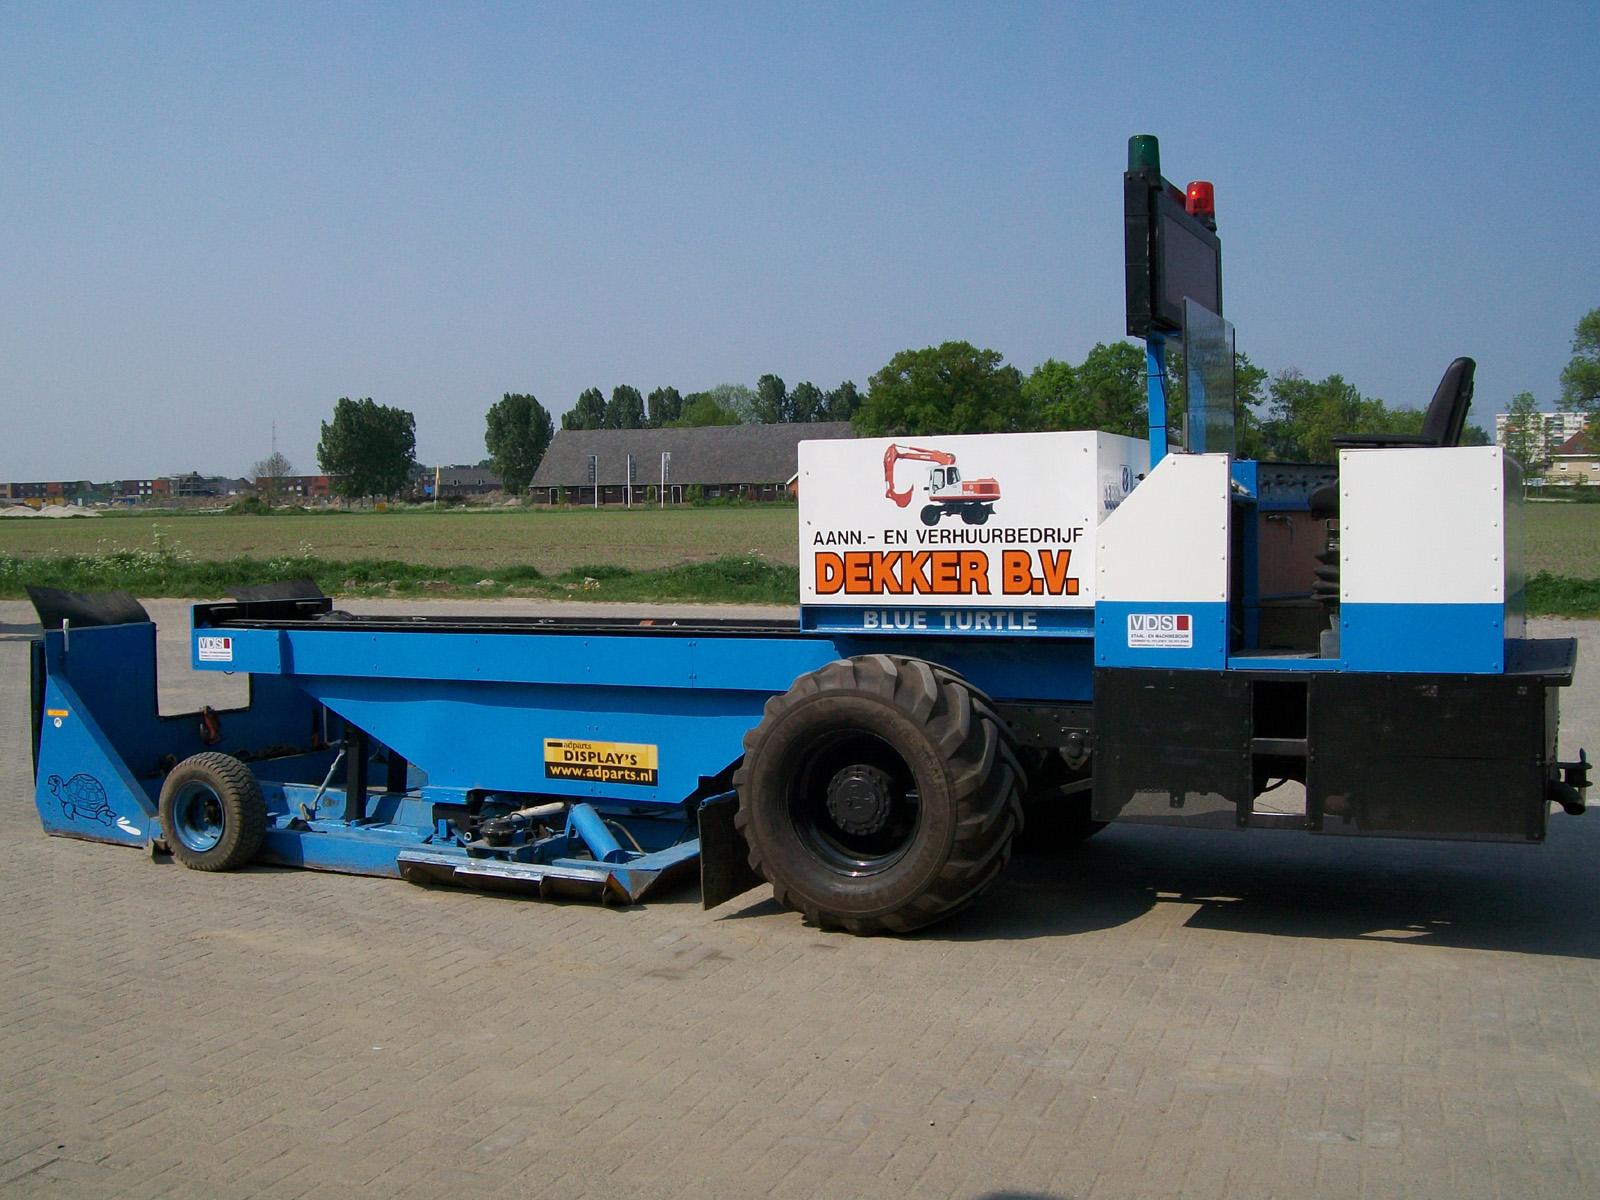 https://www.tractorpulling.nl/informatie/sleepwagen/blueturtle.jpg